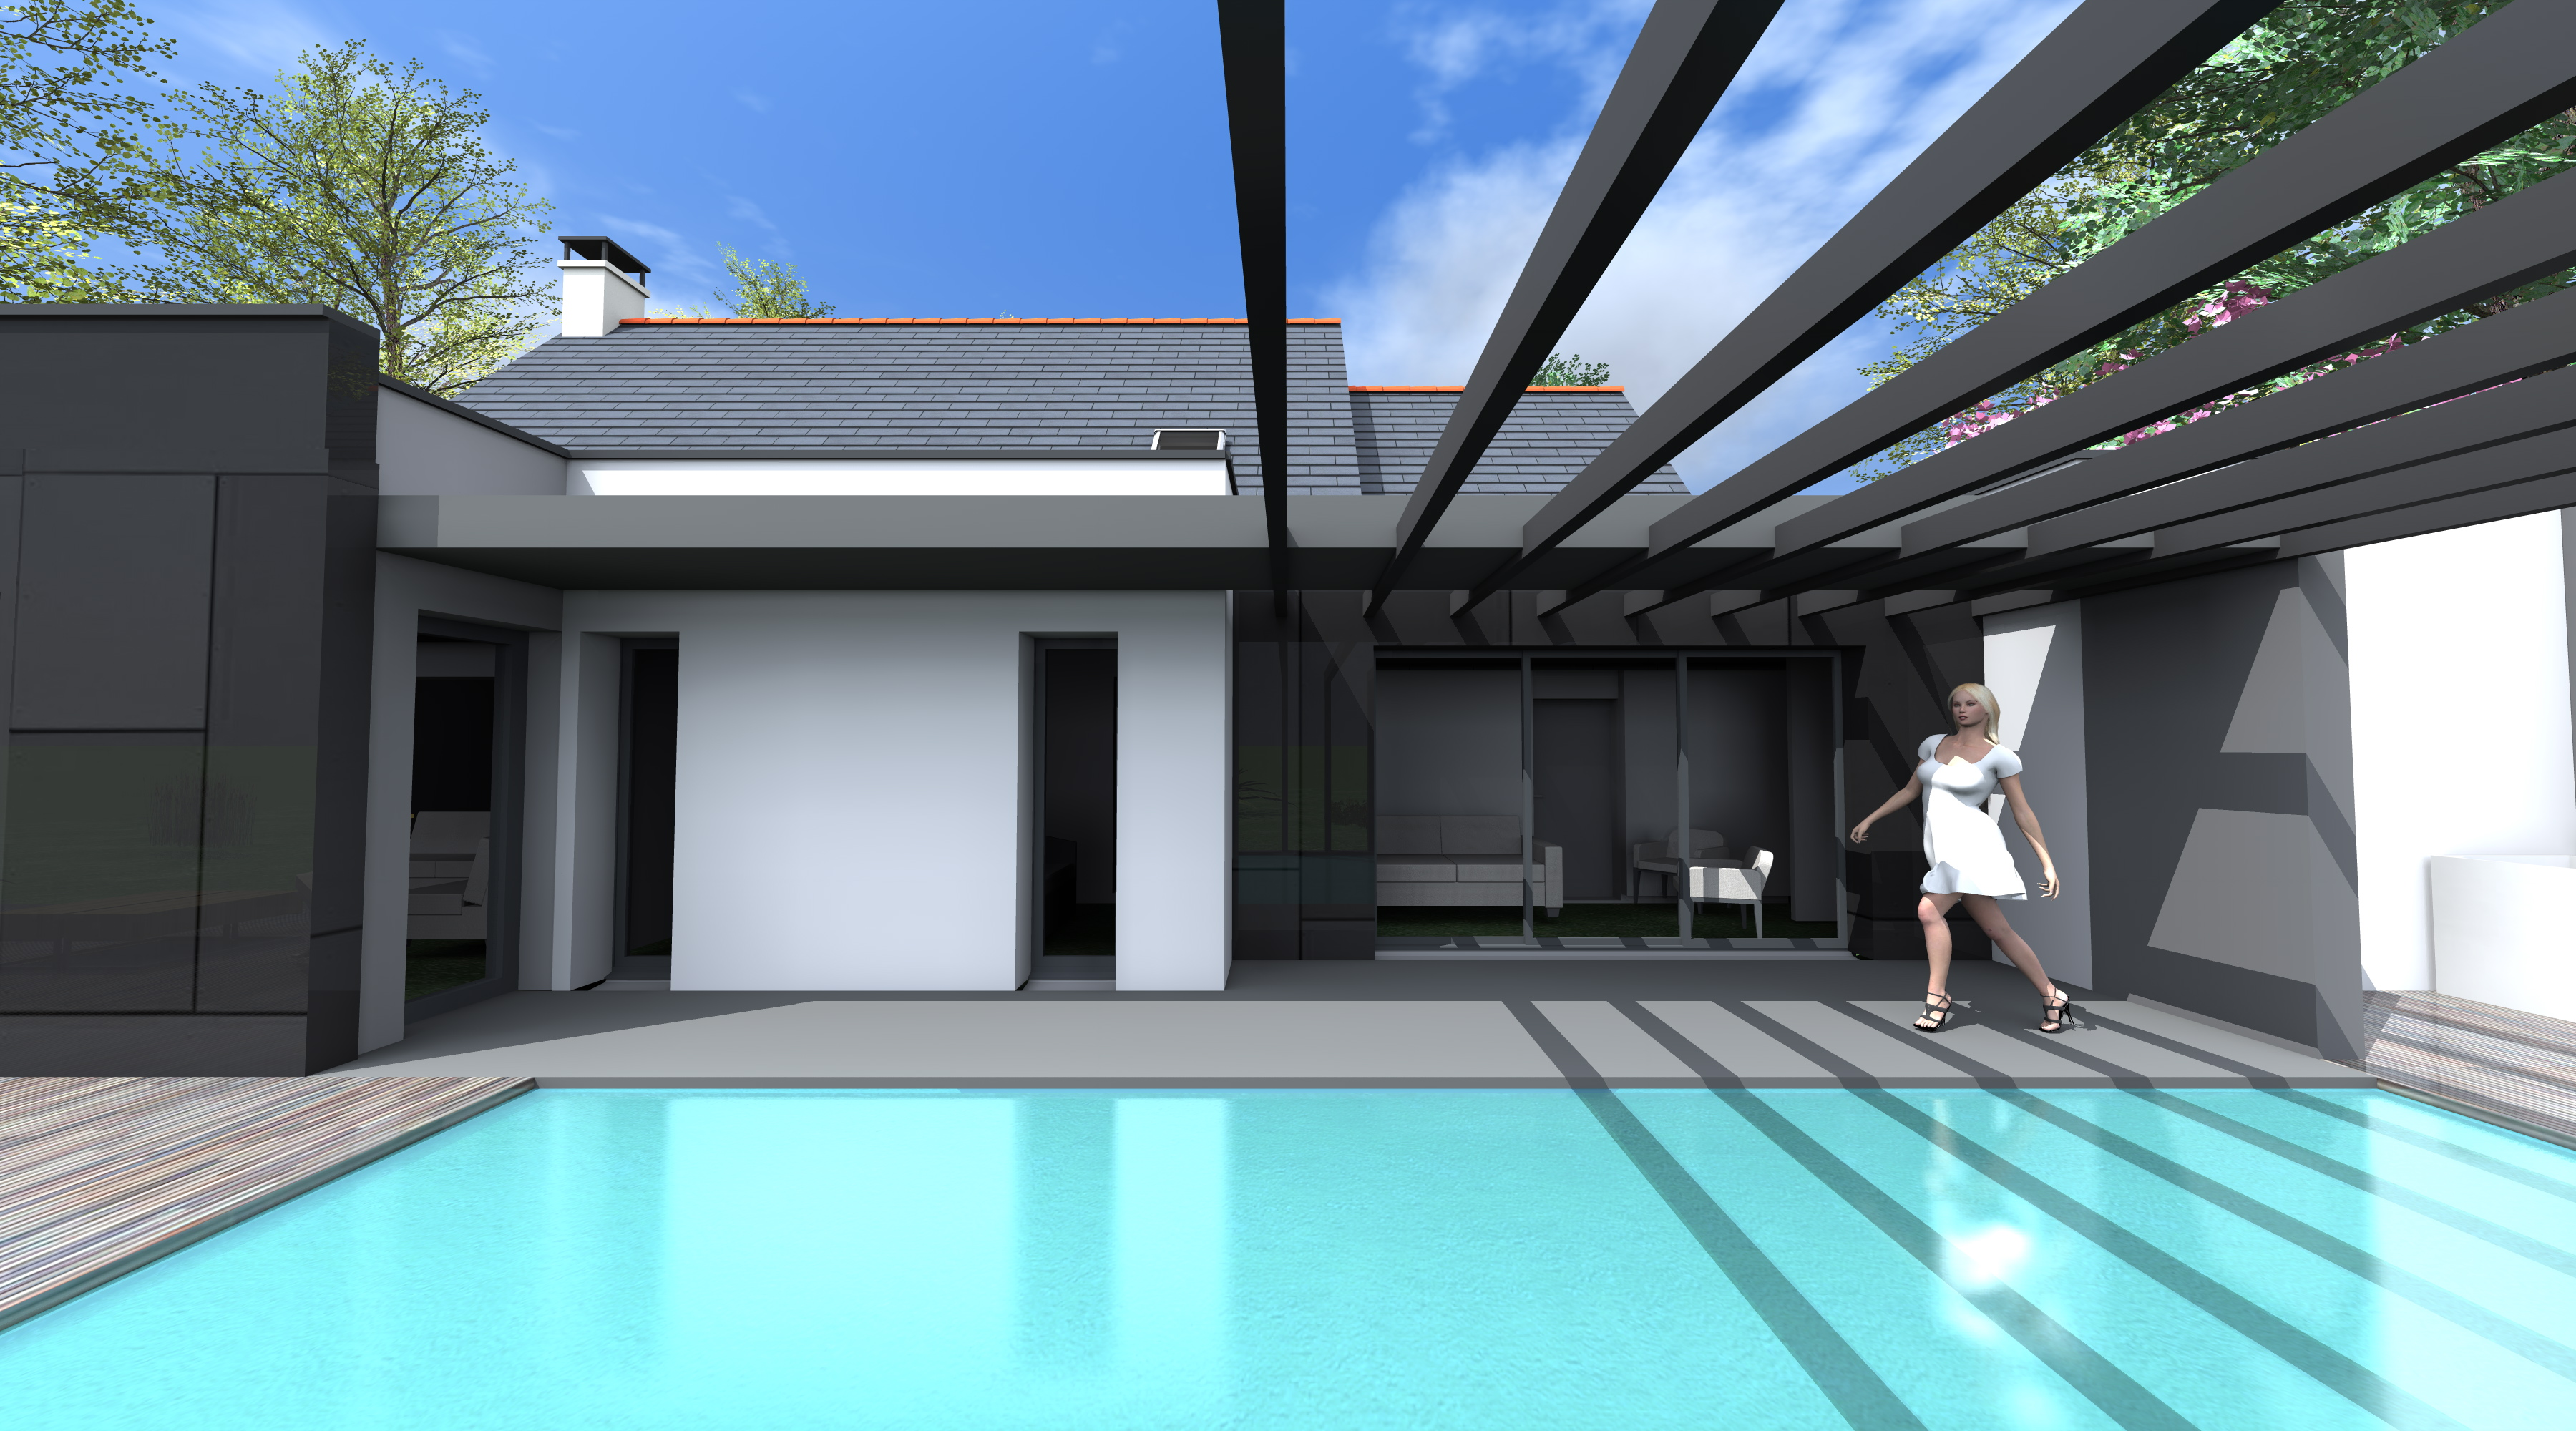 Projet k k 1 2 vue architecte lise roturier rennes for Piscine architecture